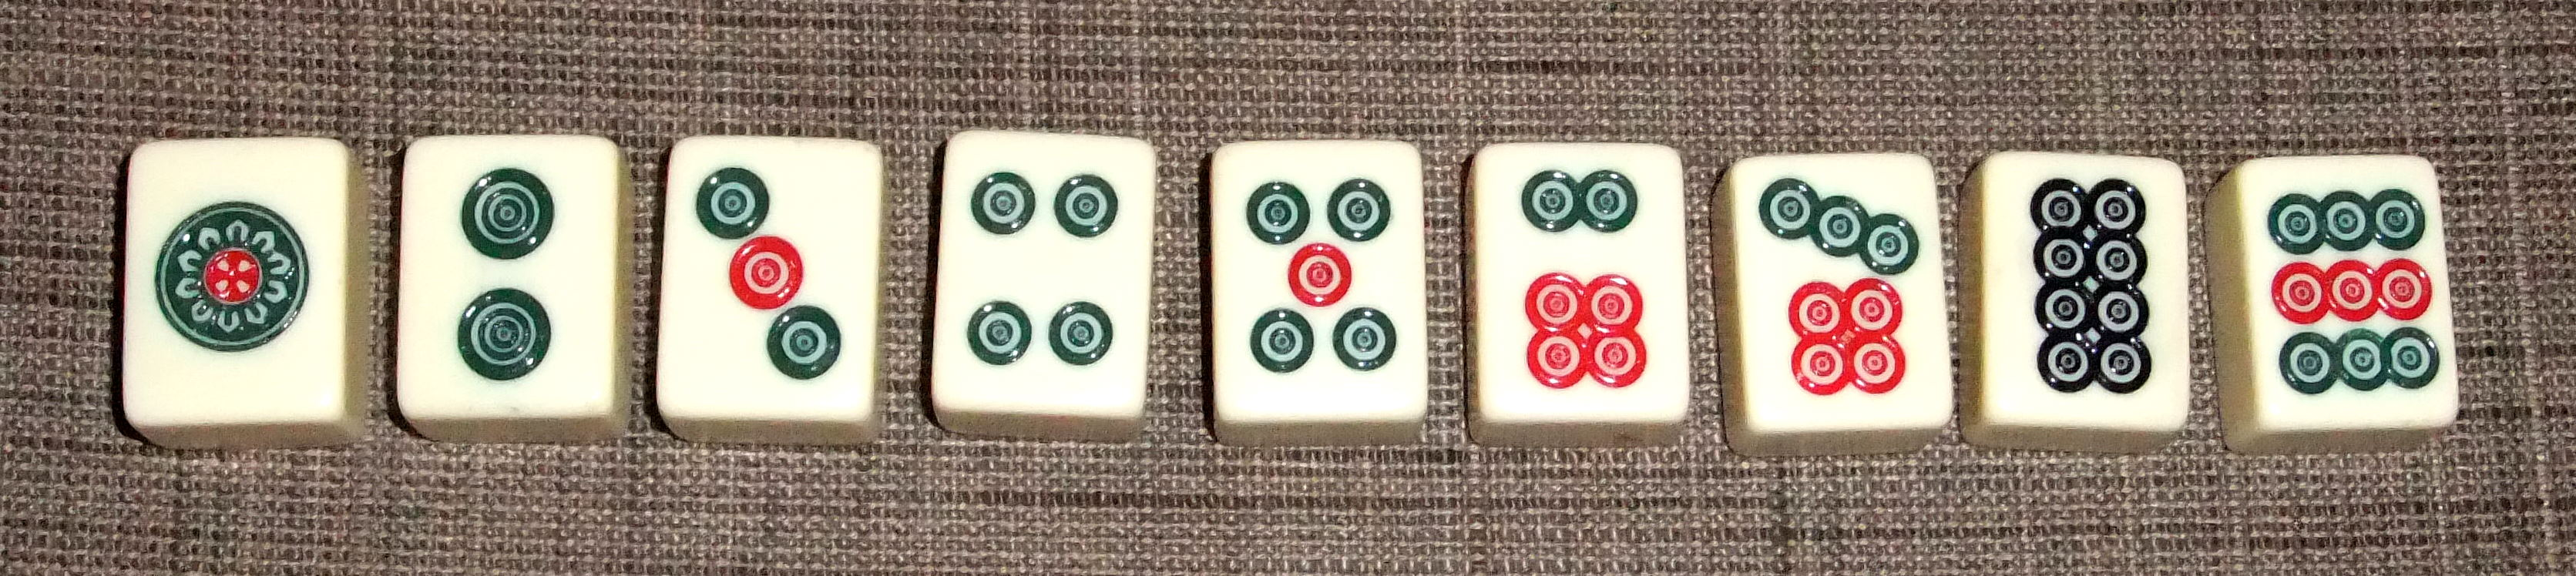 mahjong-tiles-circles.jpg